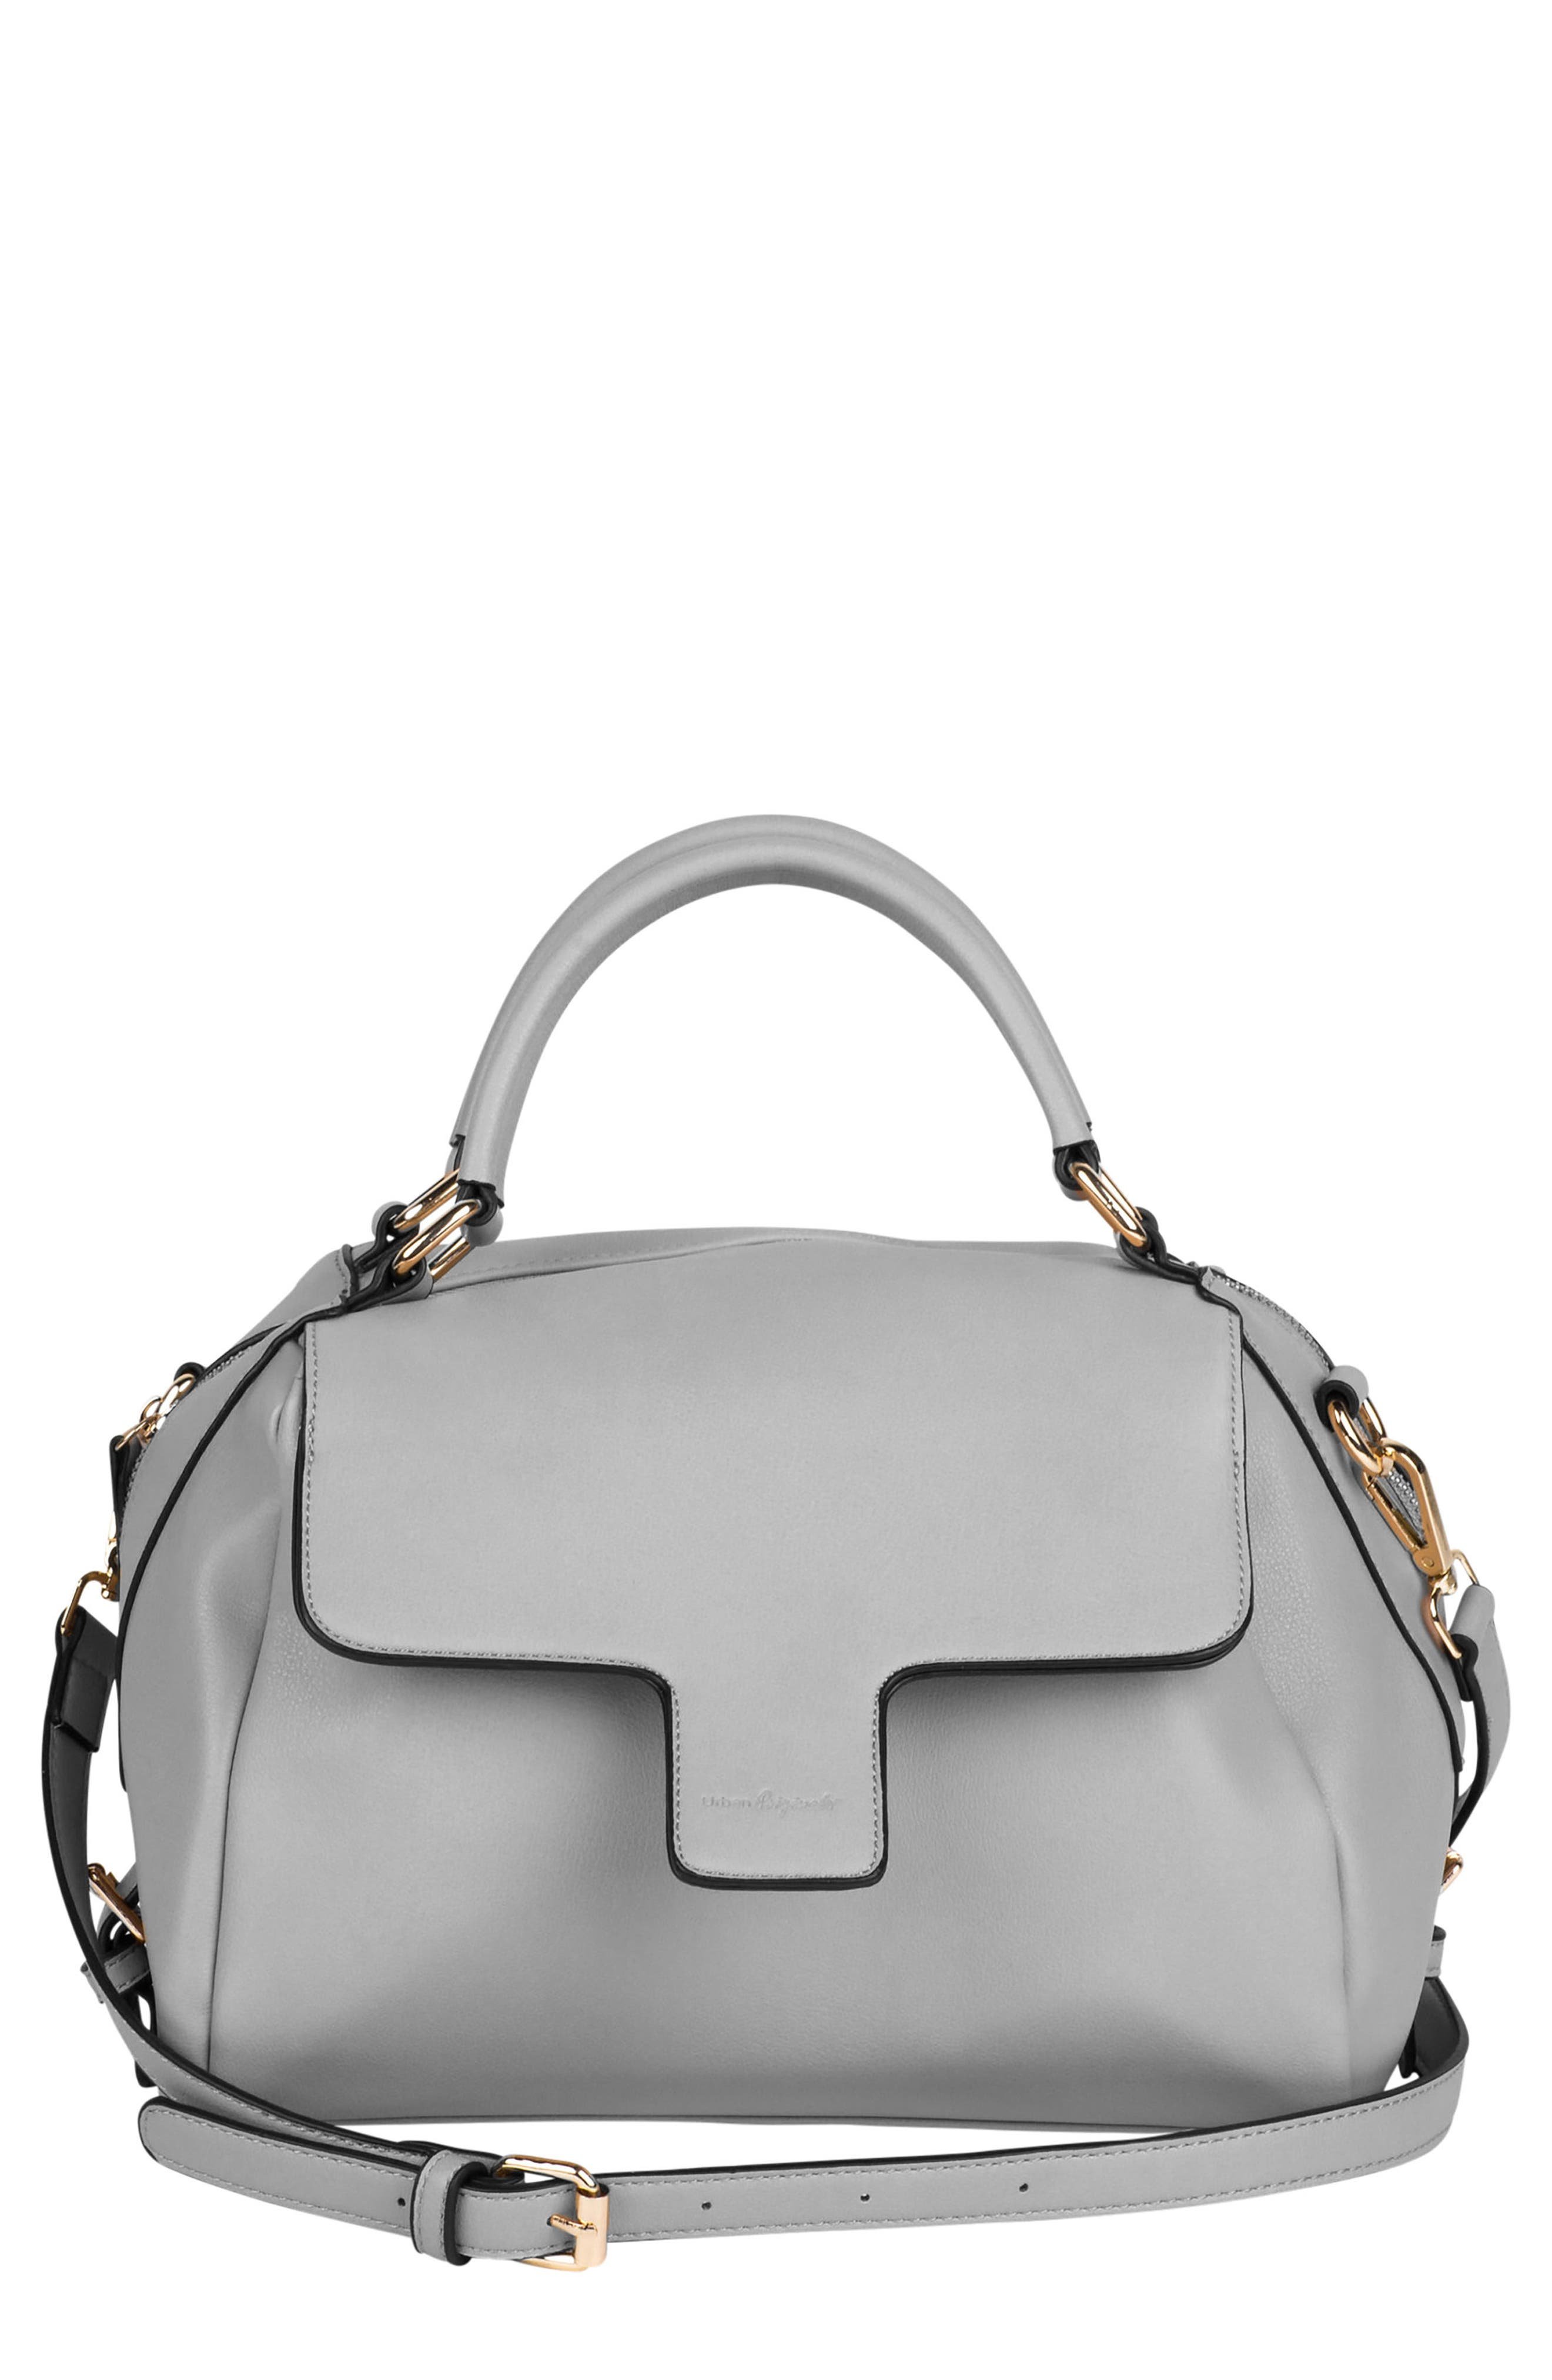 Twilight Vegan Leather Convertible Tote Bag,                             Main thumbnail 1, color,                             020